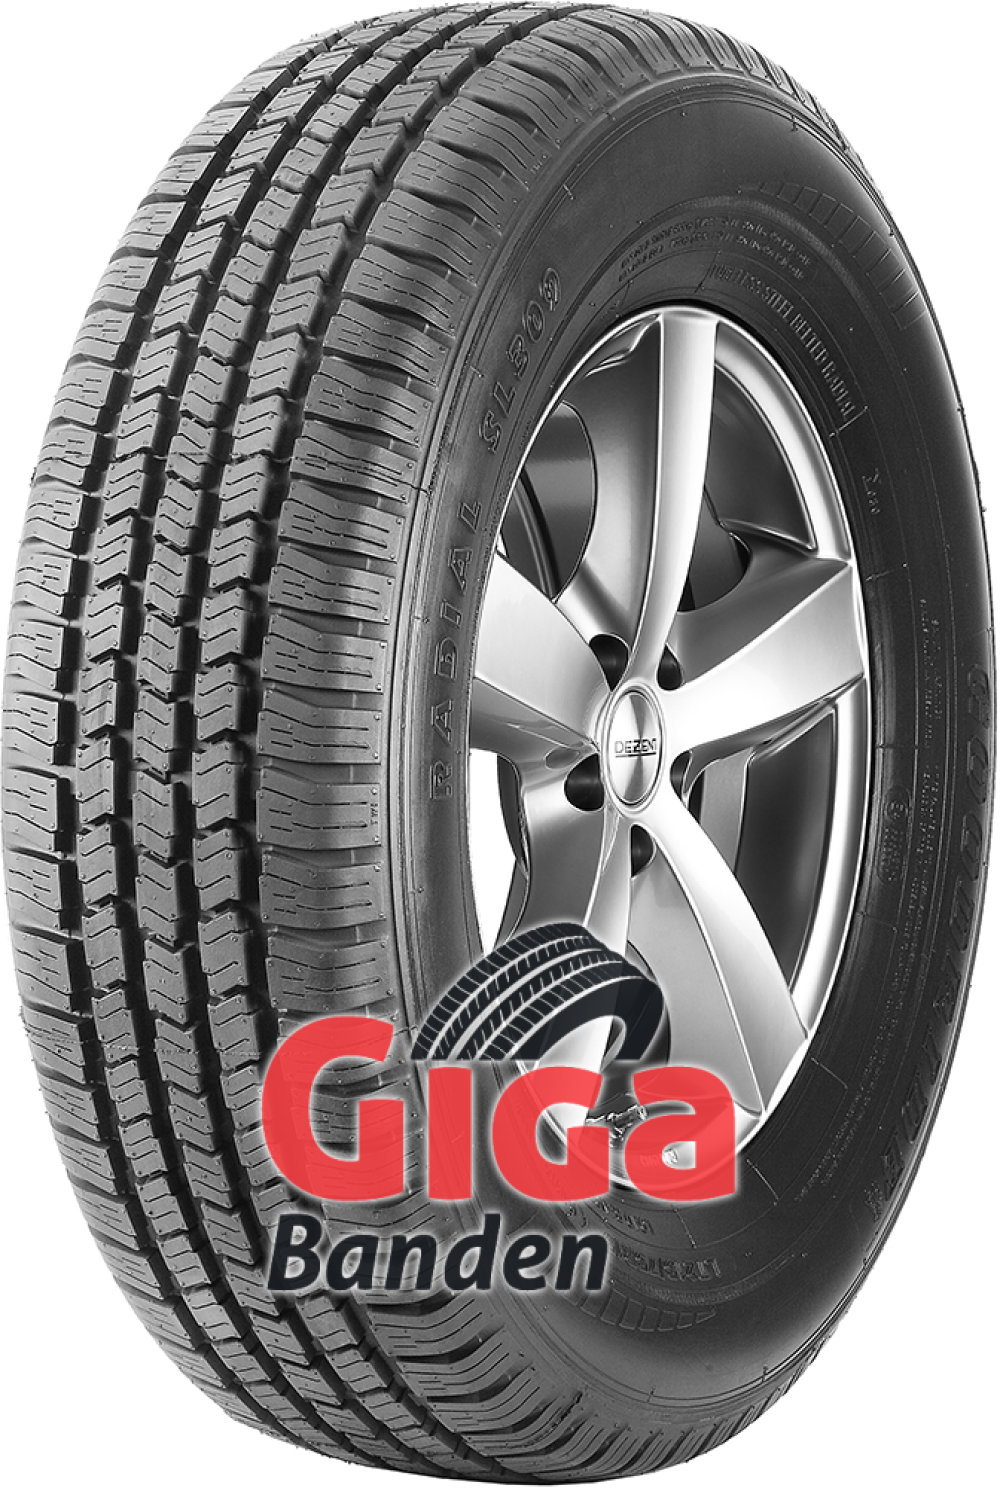 Goodride SL309 Radial ( LT225/75 R16 115/112Q 10PR )